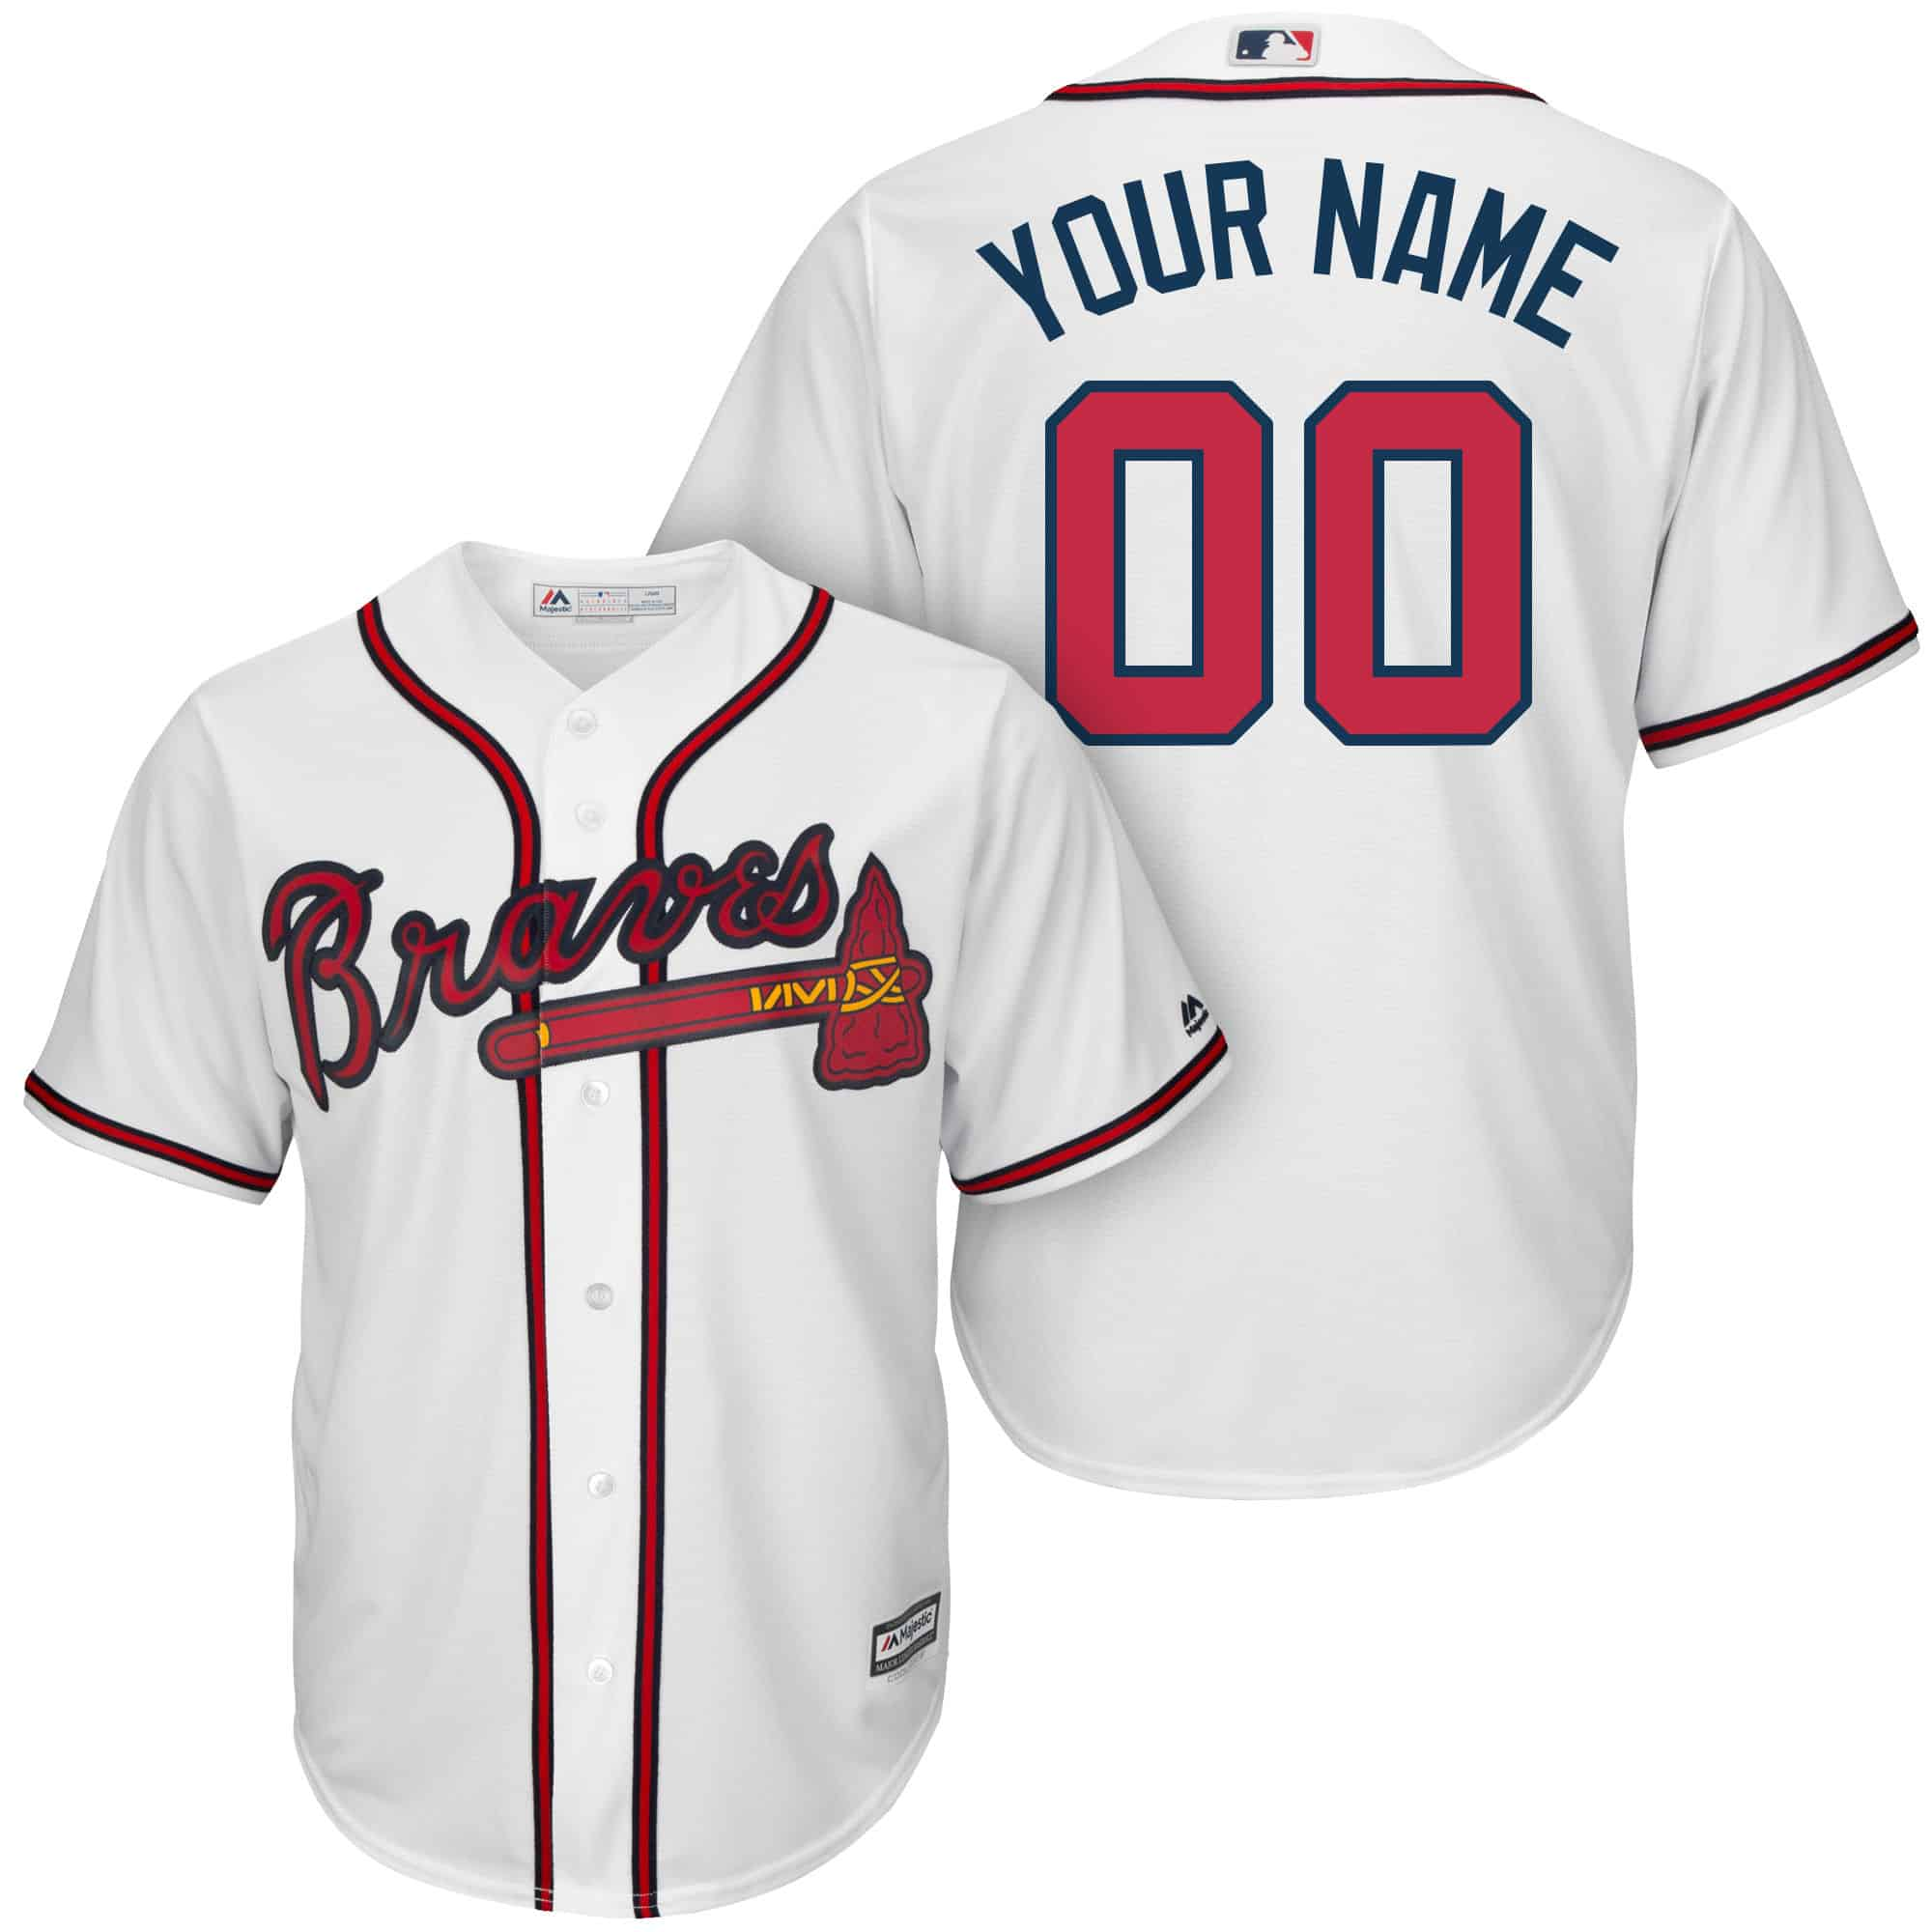 Atlanta braves jersey tee hoodie s 2x big 3x 4x 5x 6x for Hawks t shirt jersey